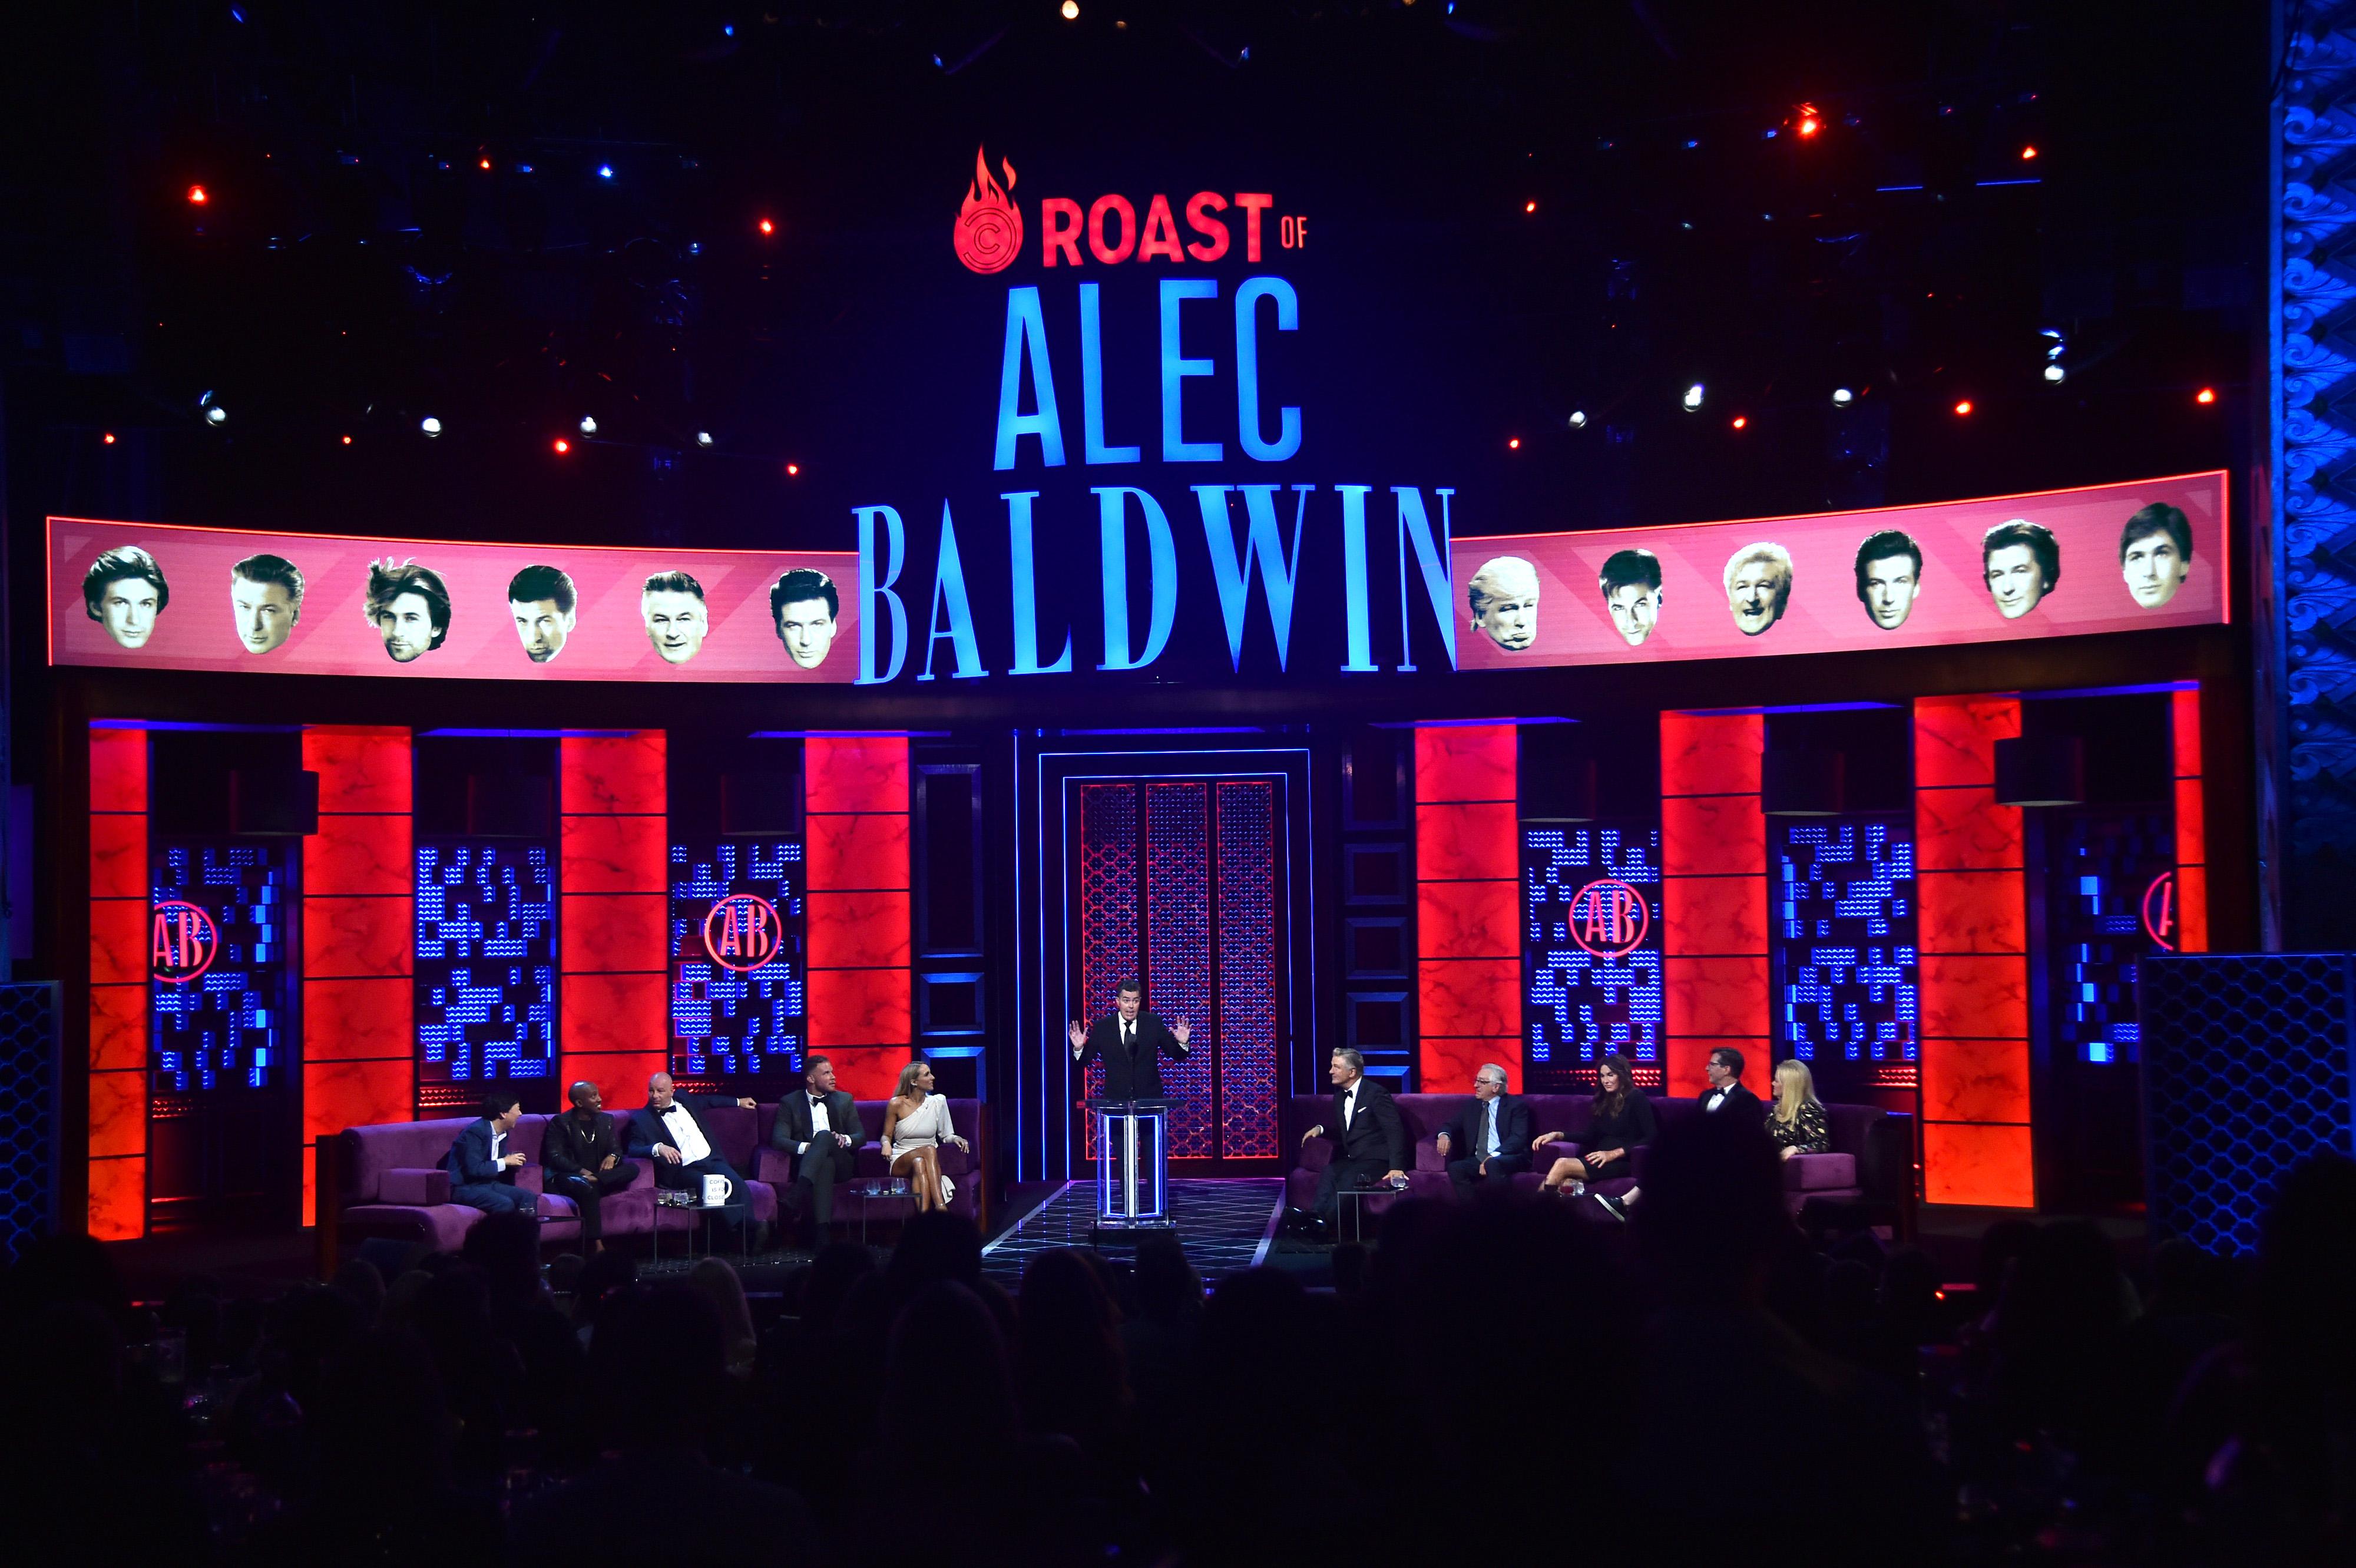 Alec Baldwin Roast Dais